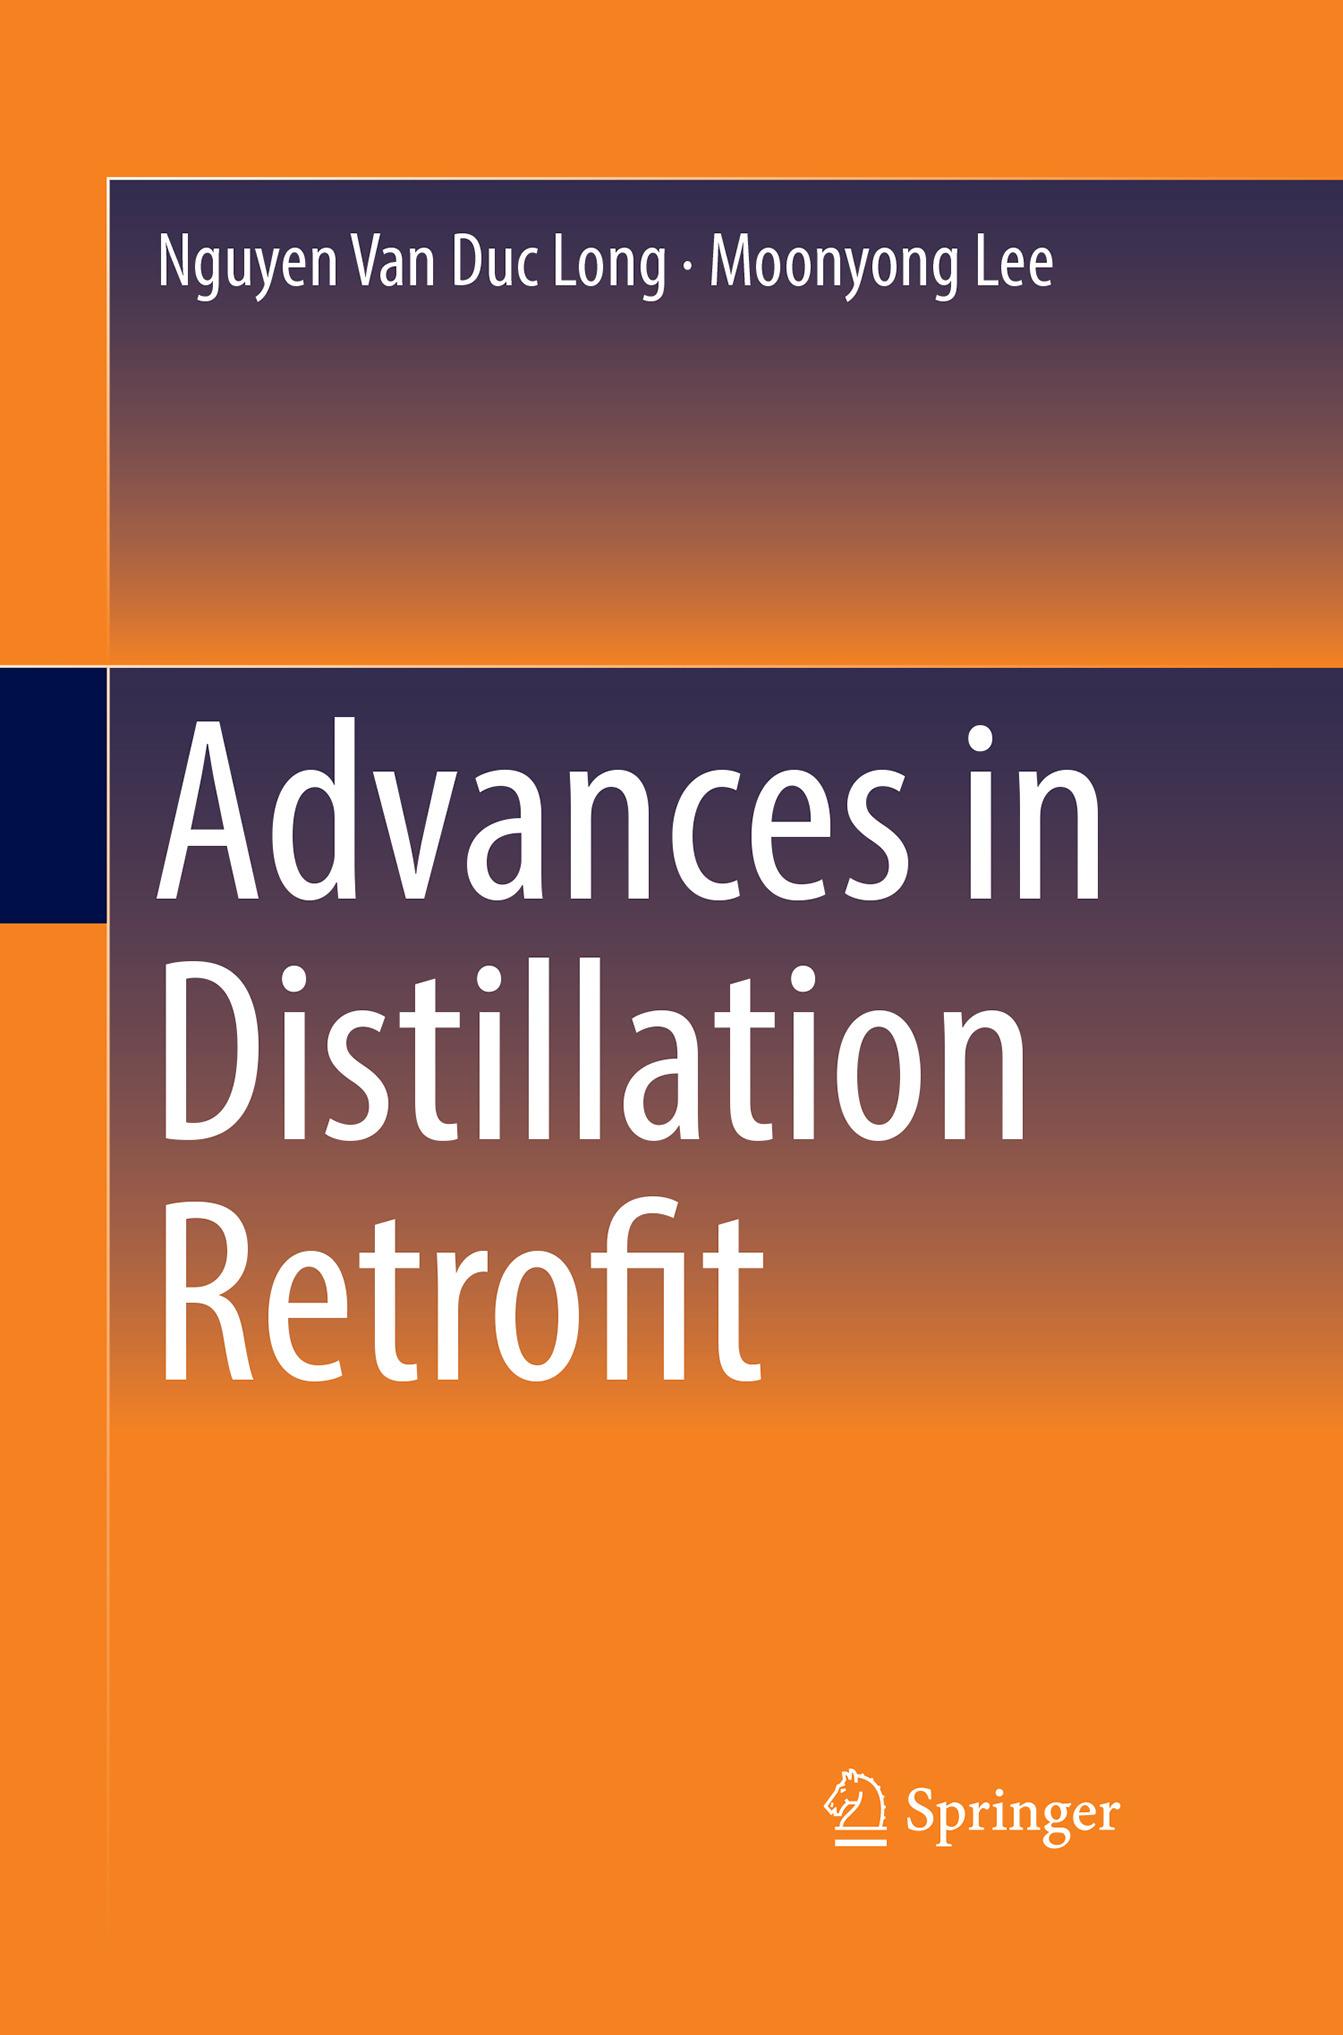 Lee, Moonyong - Advances in Distillation Retrofit, ebook